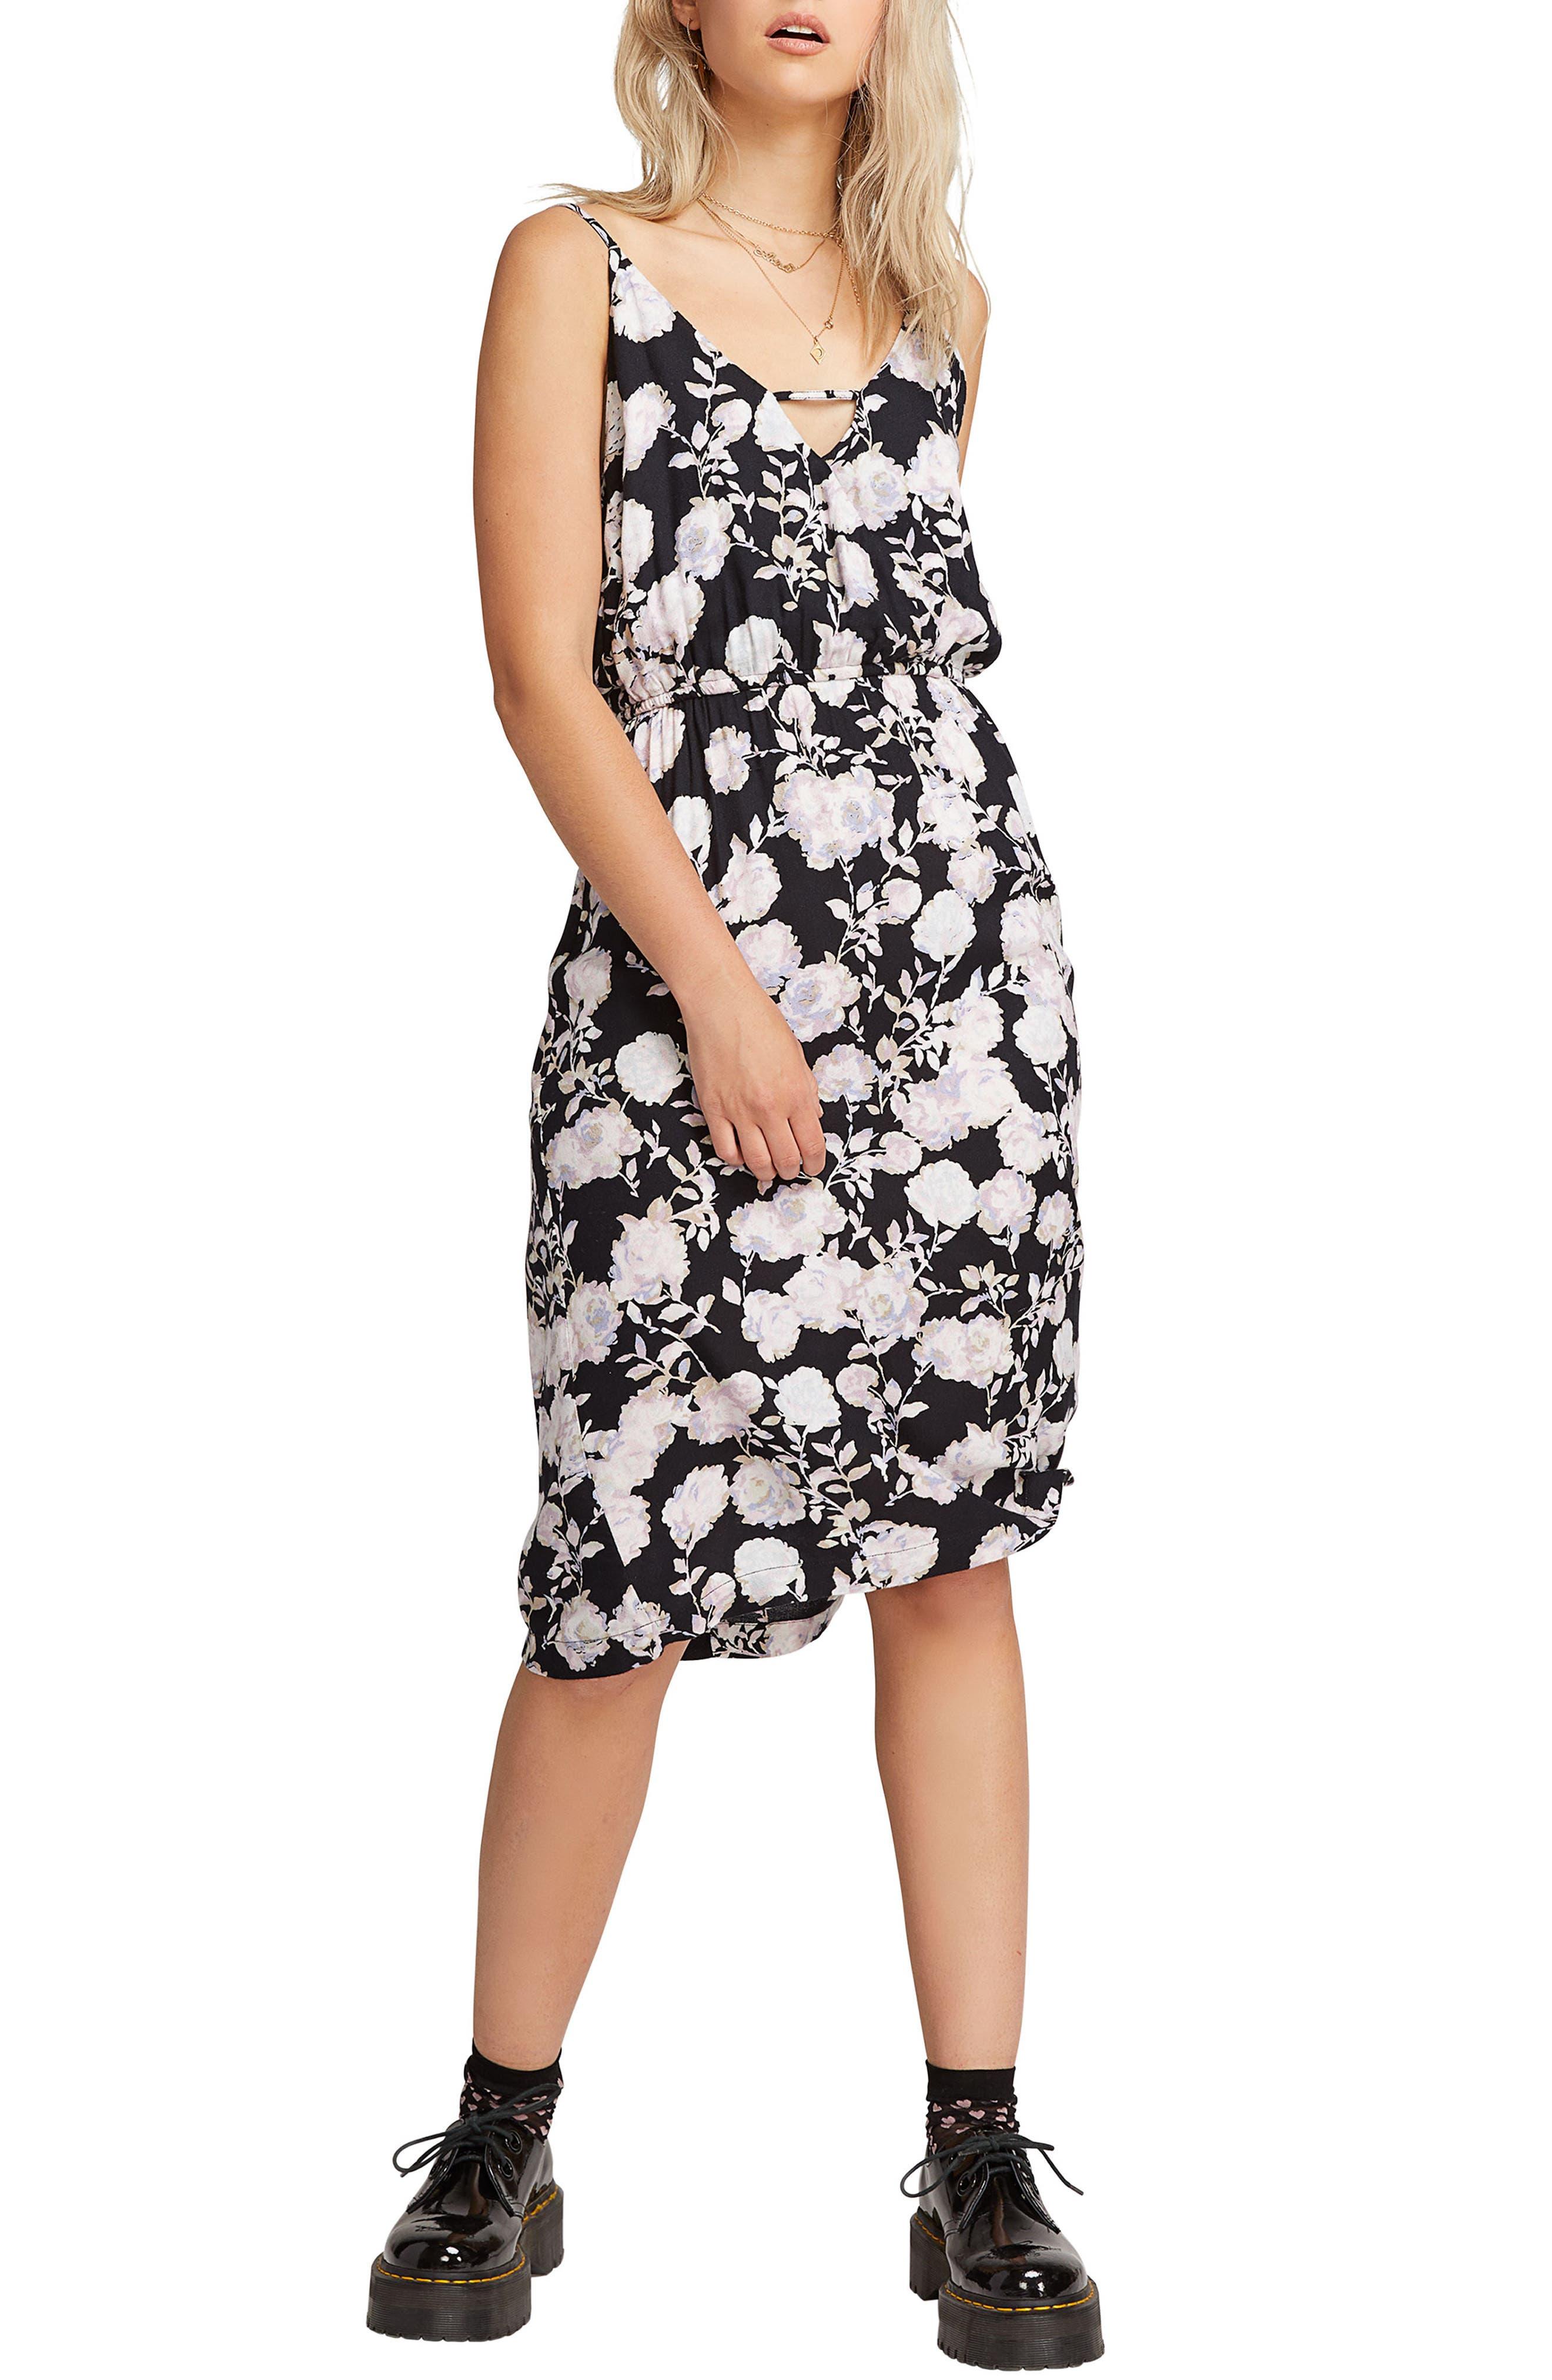 Volcom That Was Fun Floral Print Dress, Black